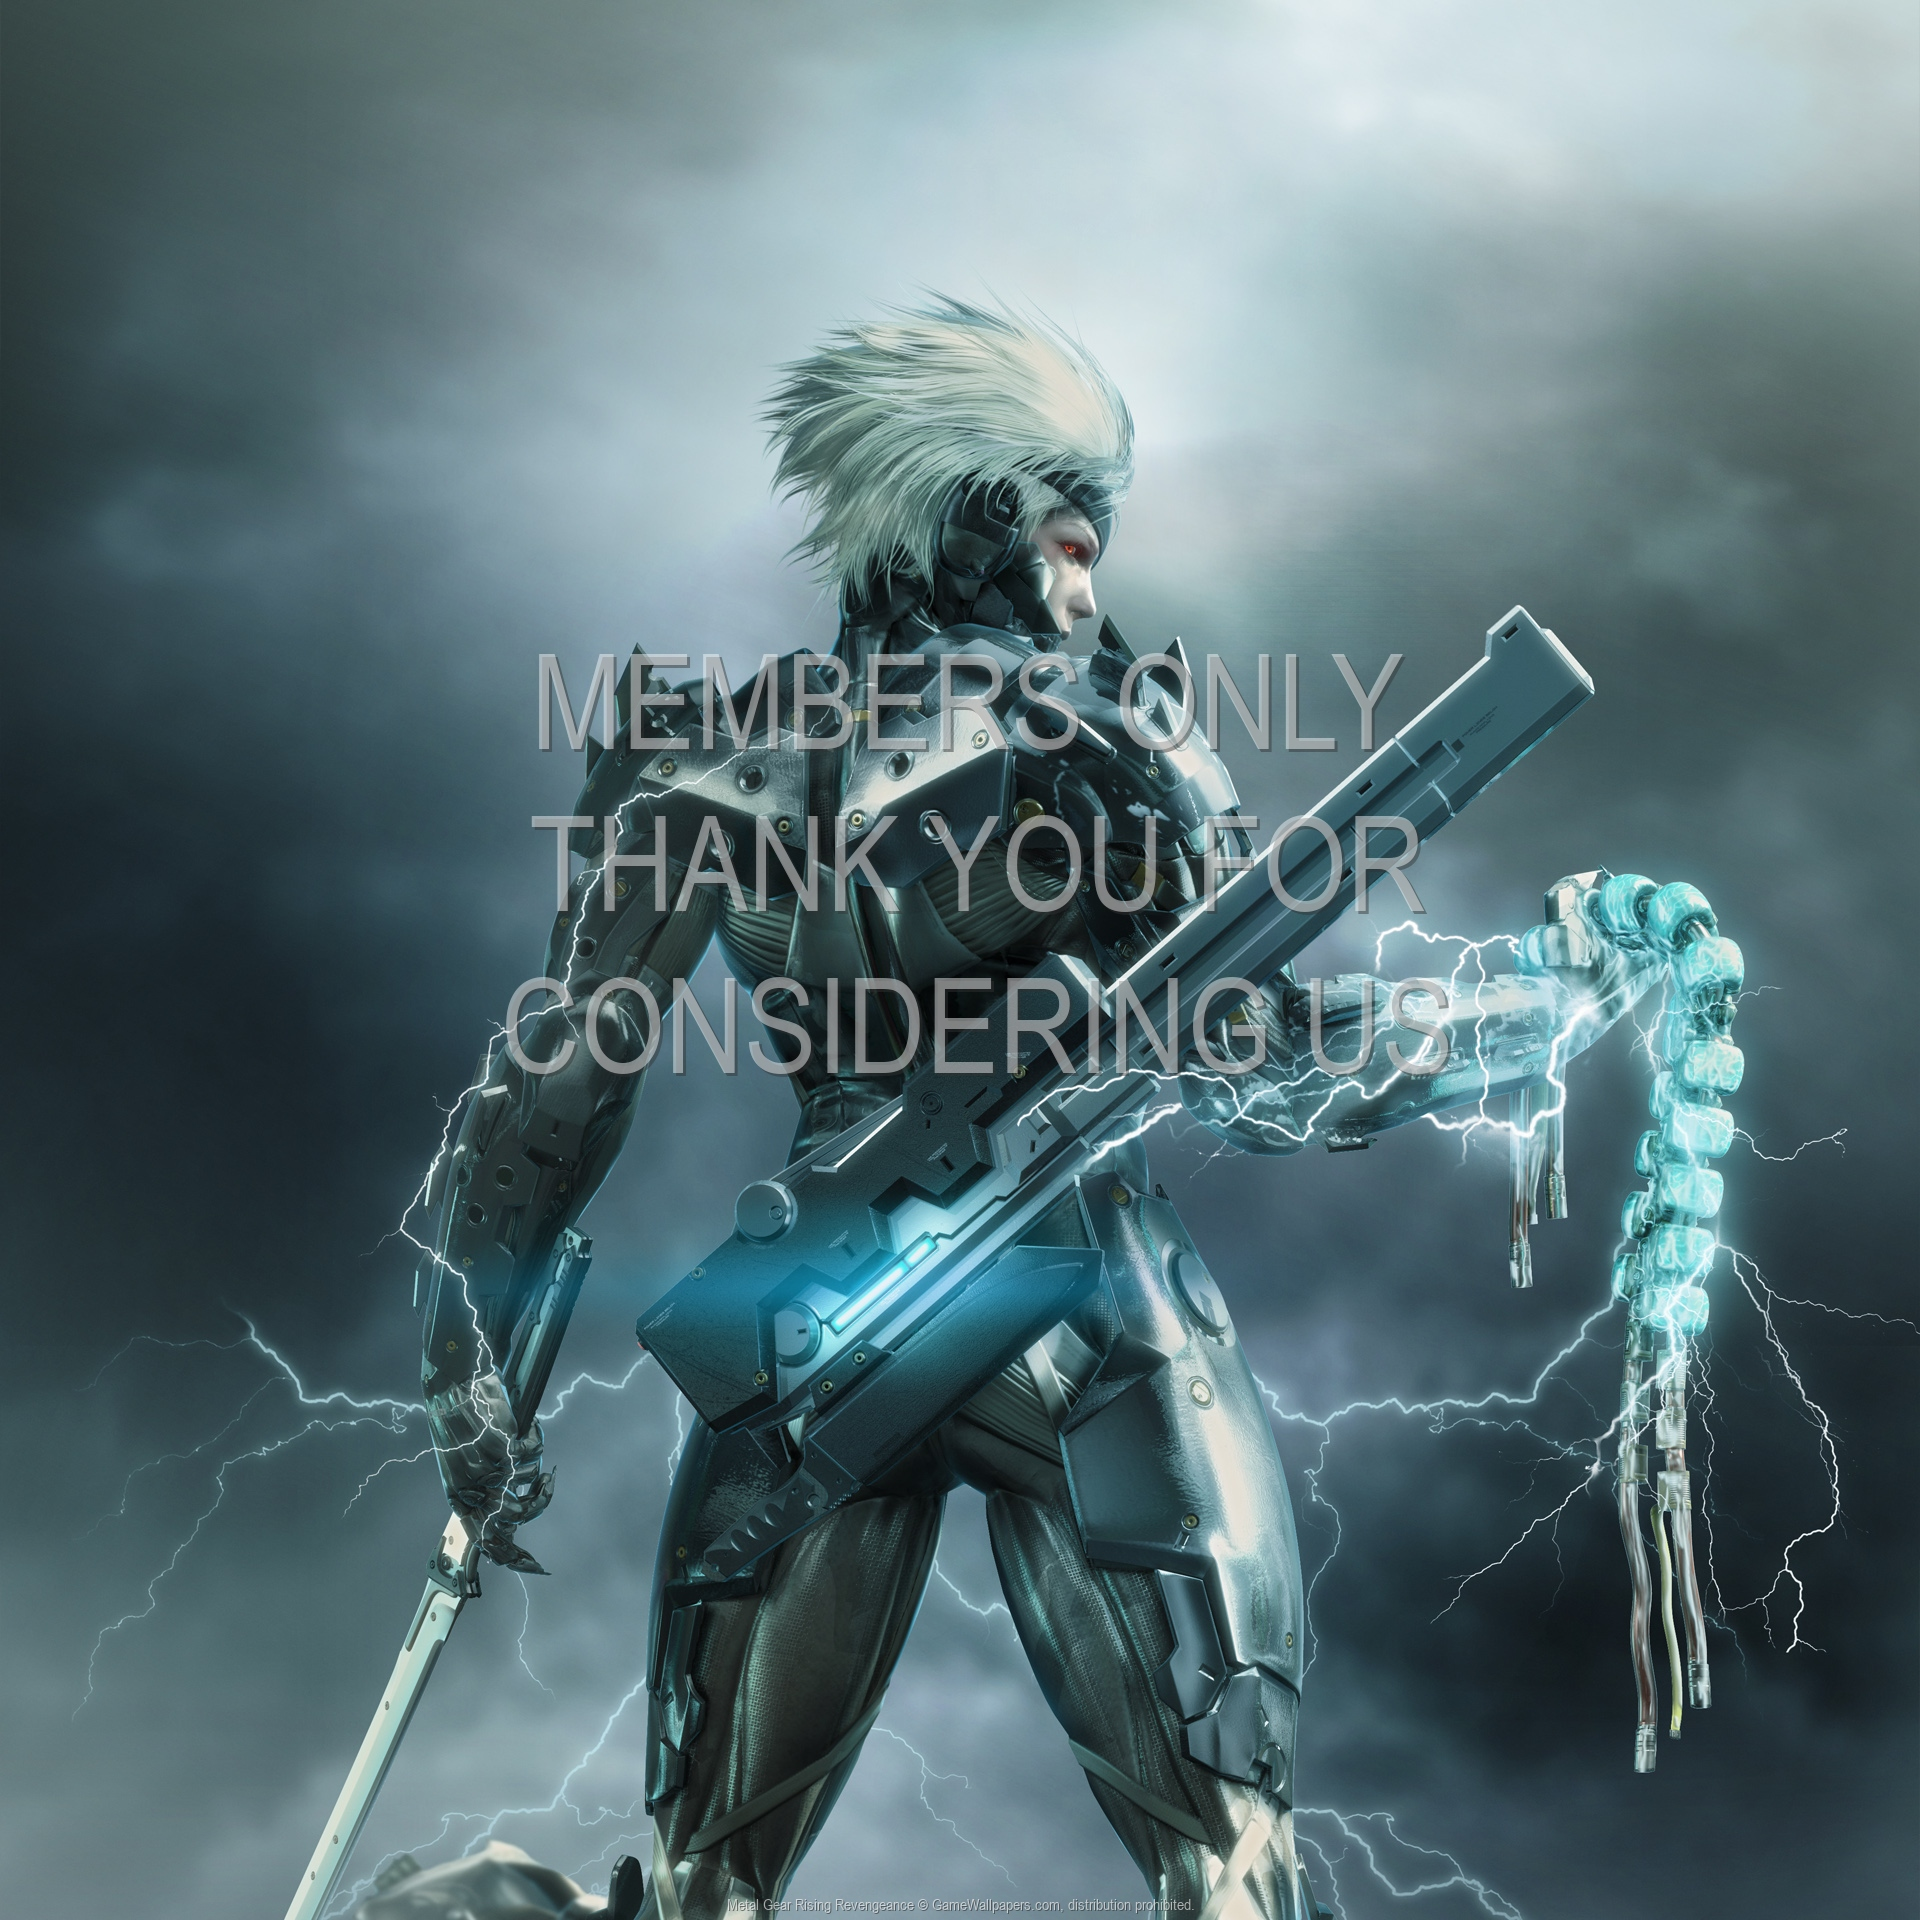 Metal Gear Rising Revengeance Wallpaper 01 1920x1080